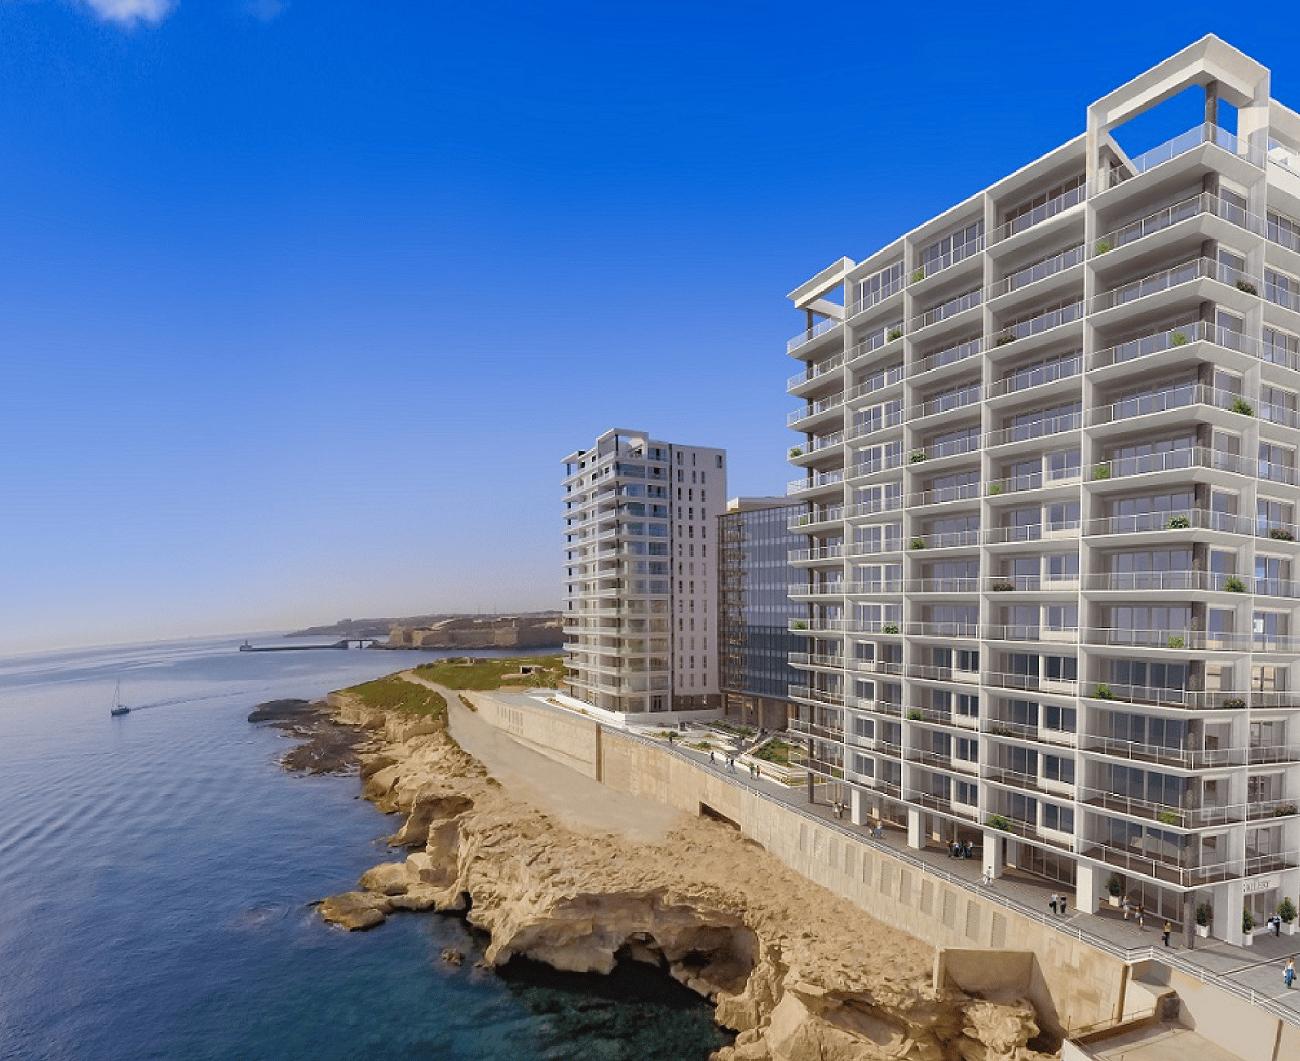 Tigné Point development Q2 awarded at the European Property Awards 2017-18